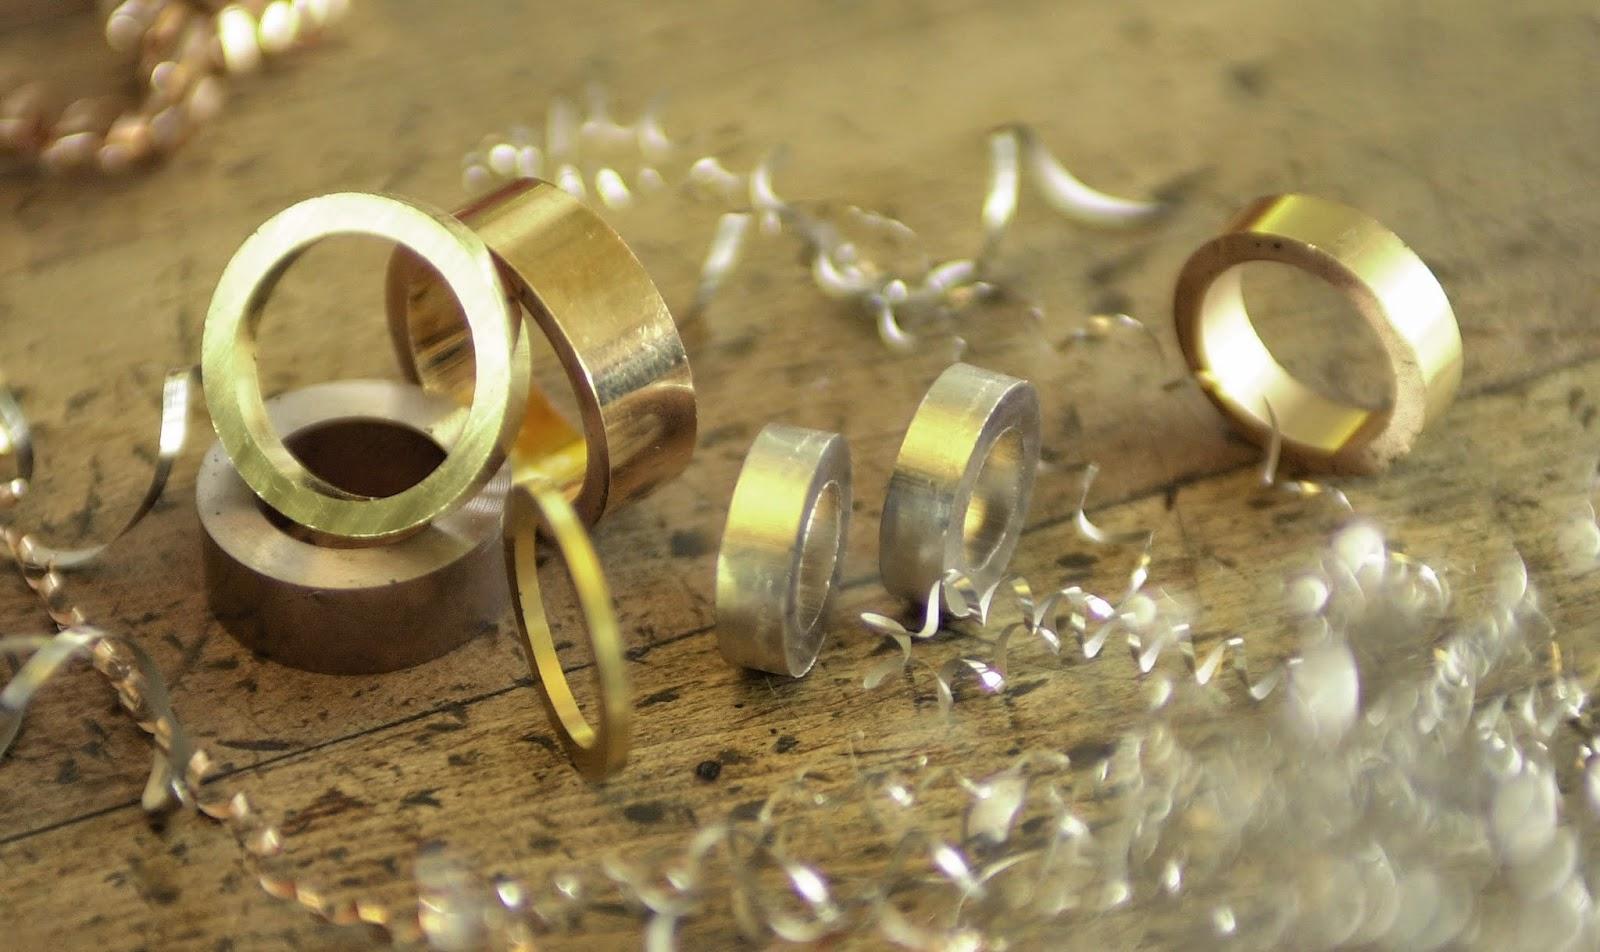 FURRER JACOT フラージャコー 名古屋 結婚指輪 栄 スイス 鍛造 ゴールド クオリティ